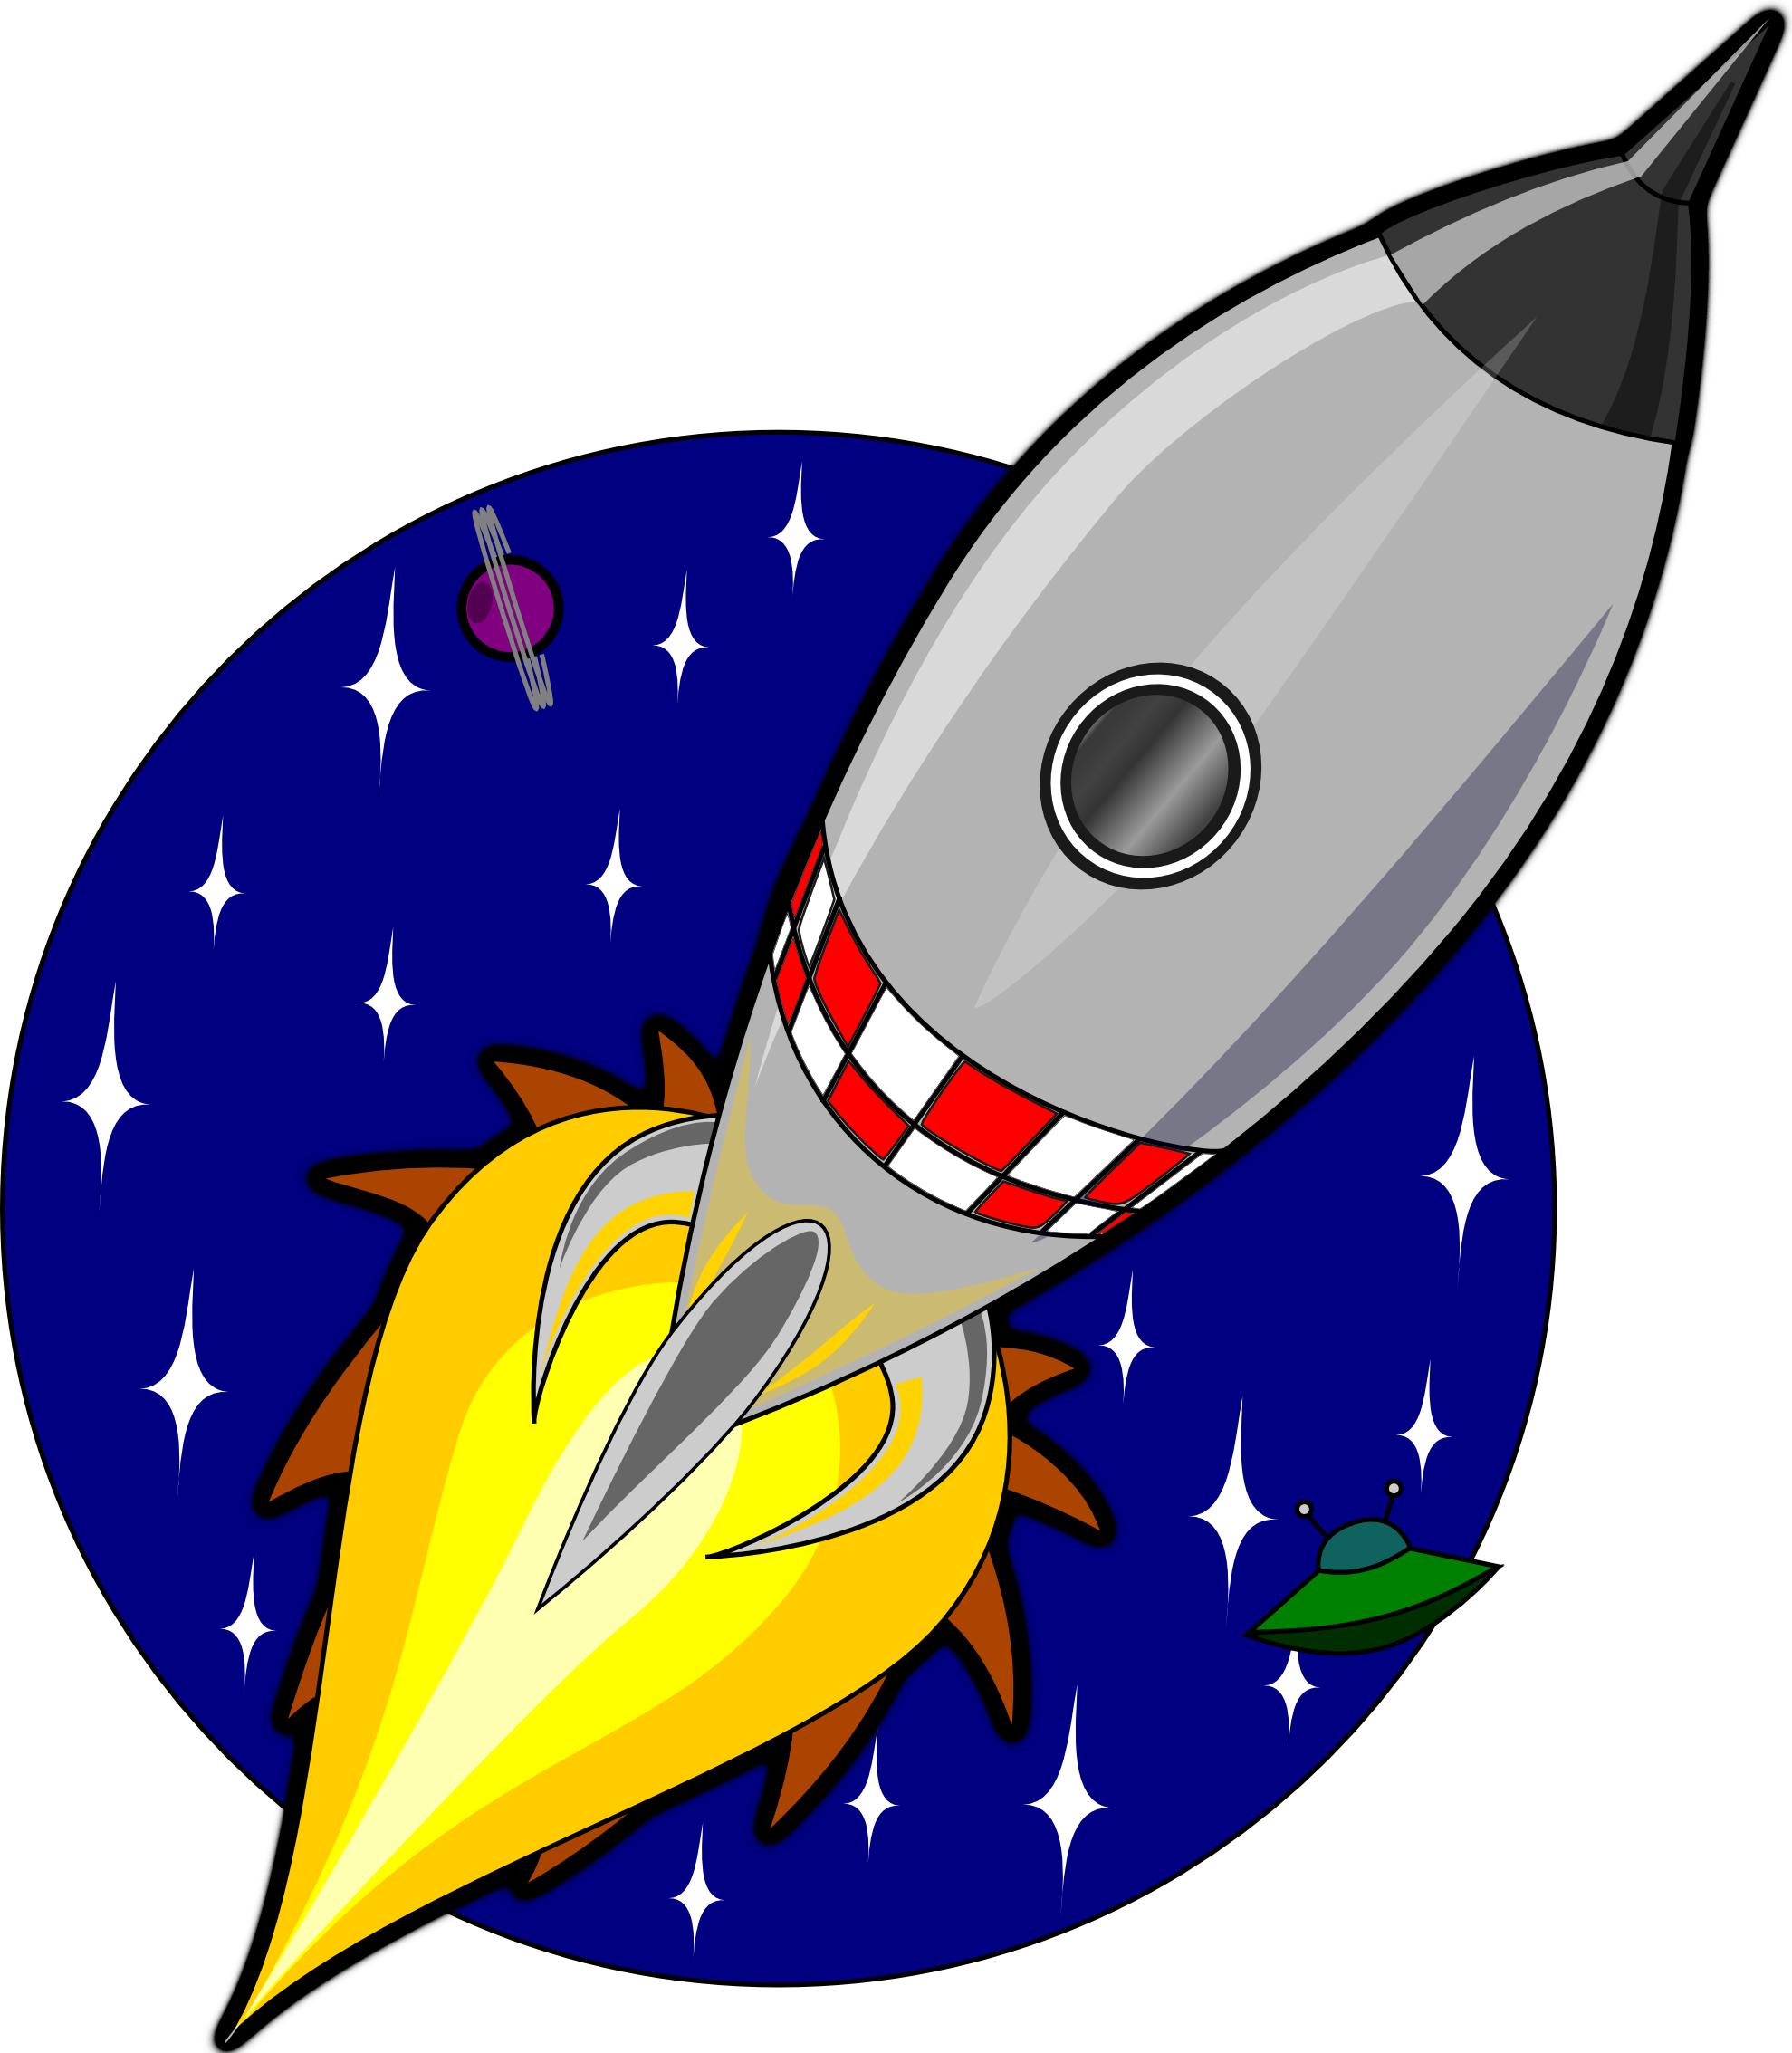 Rocket clip art free clipart images 2